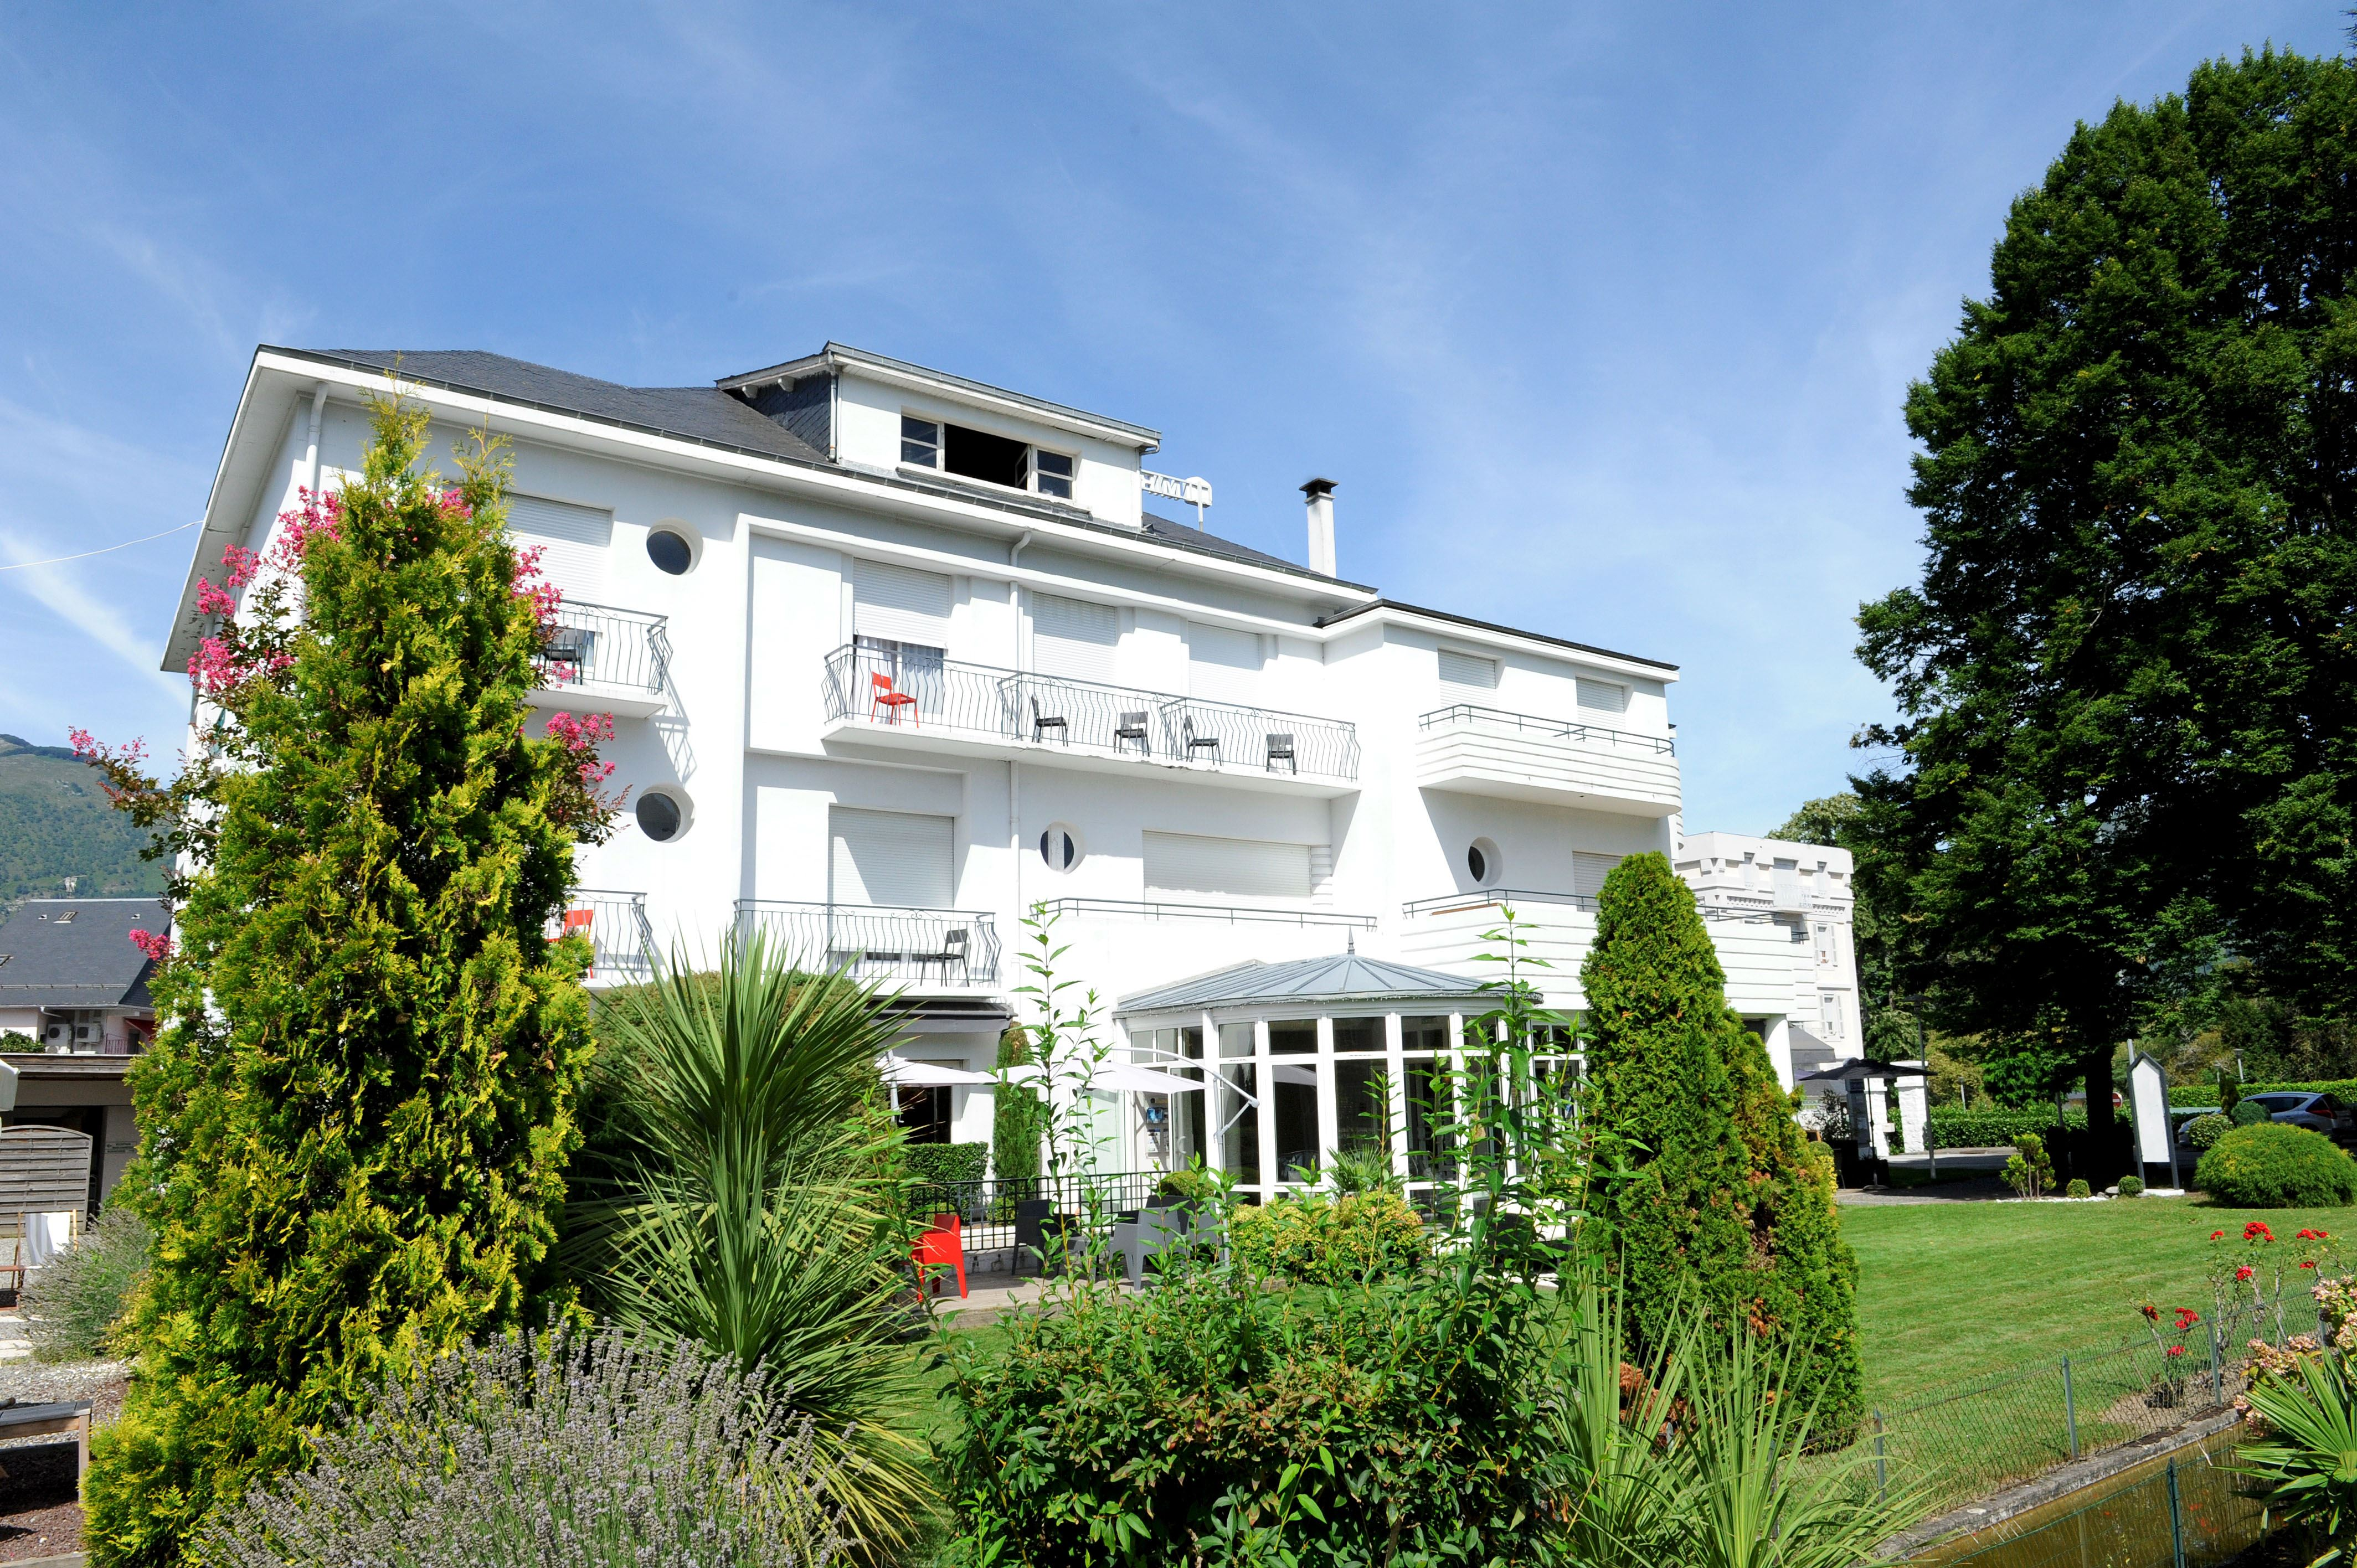 HOTEL LOGIS LE MIRAMONT